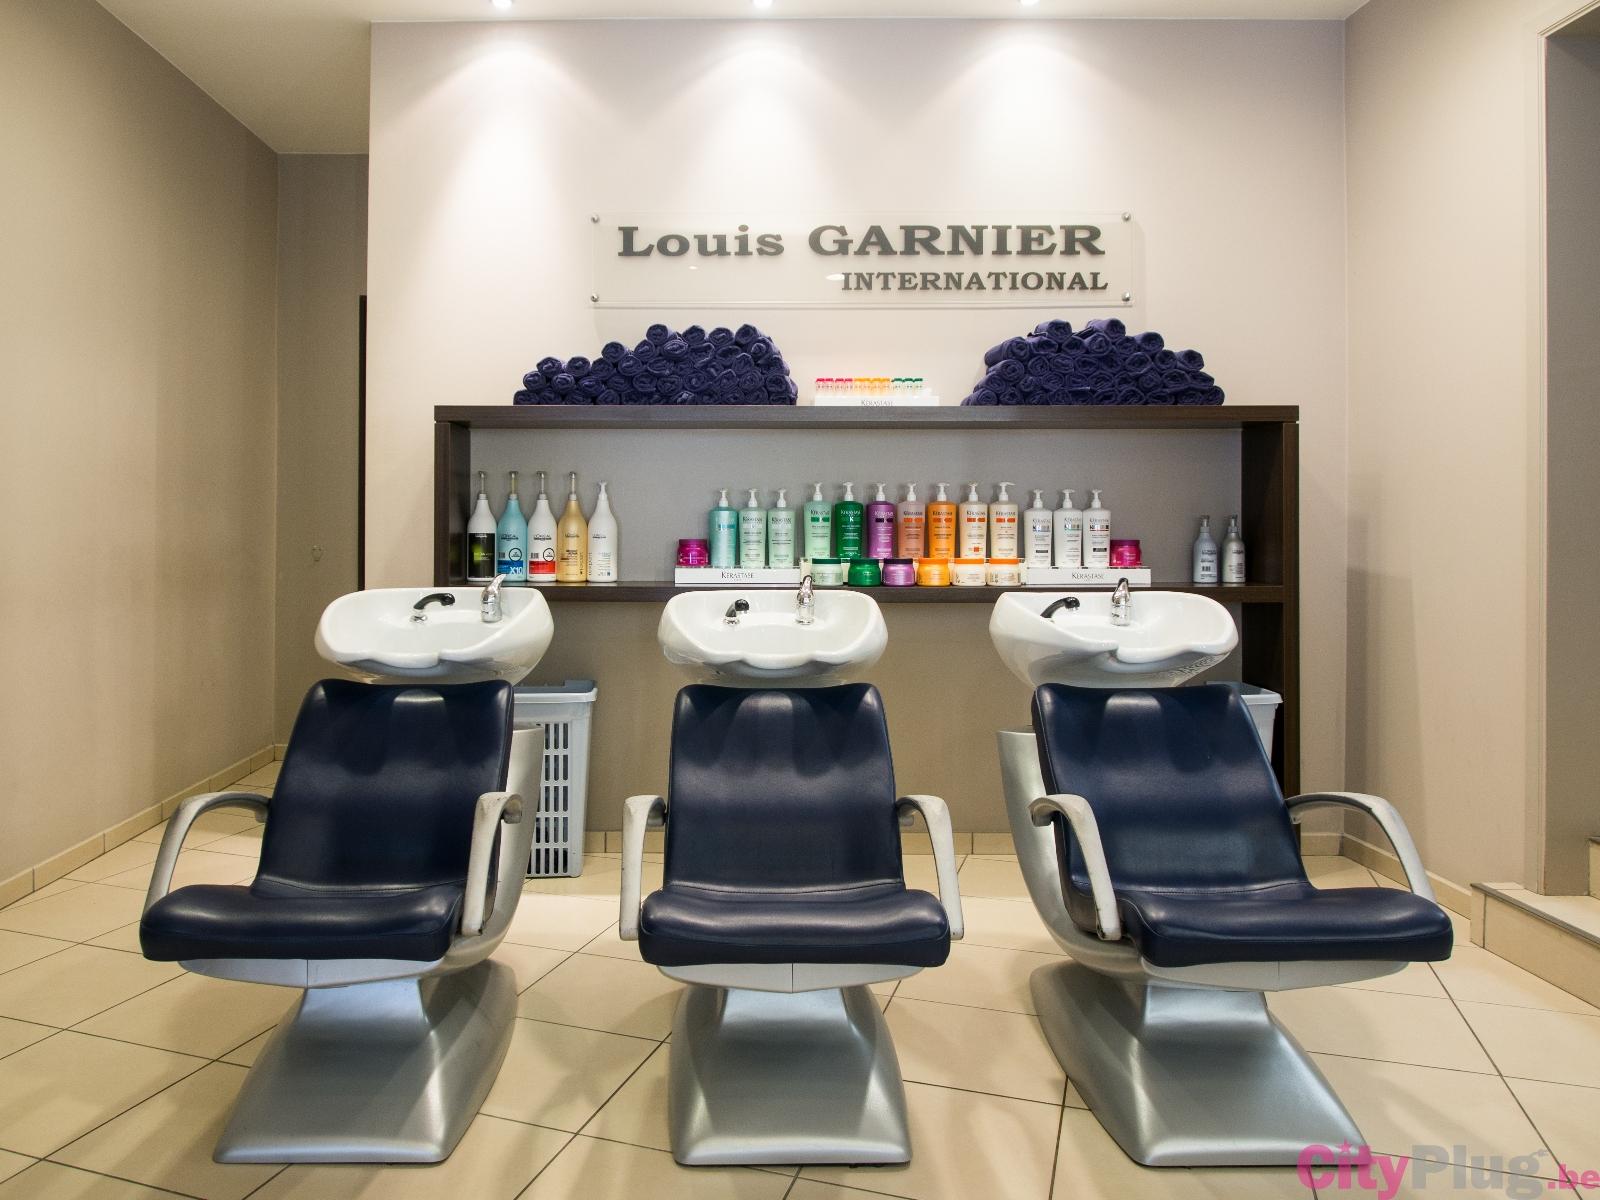 Salon de coiffure bruxelles porte de namur 28 images r for Porte revue salon de coiffure